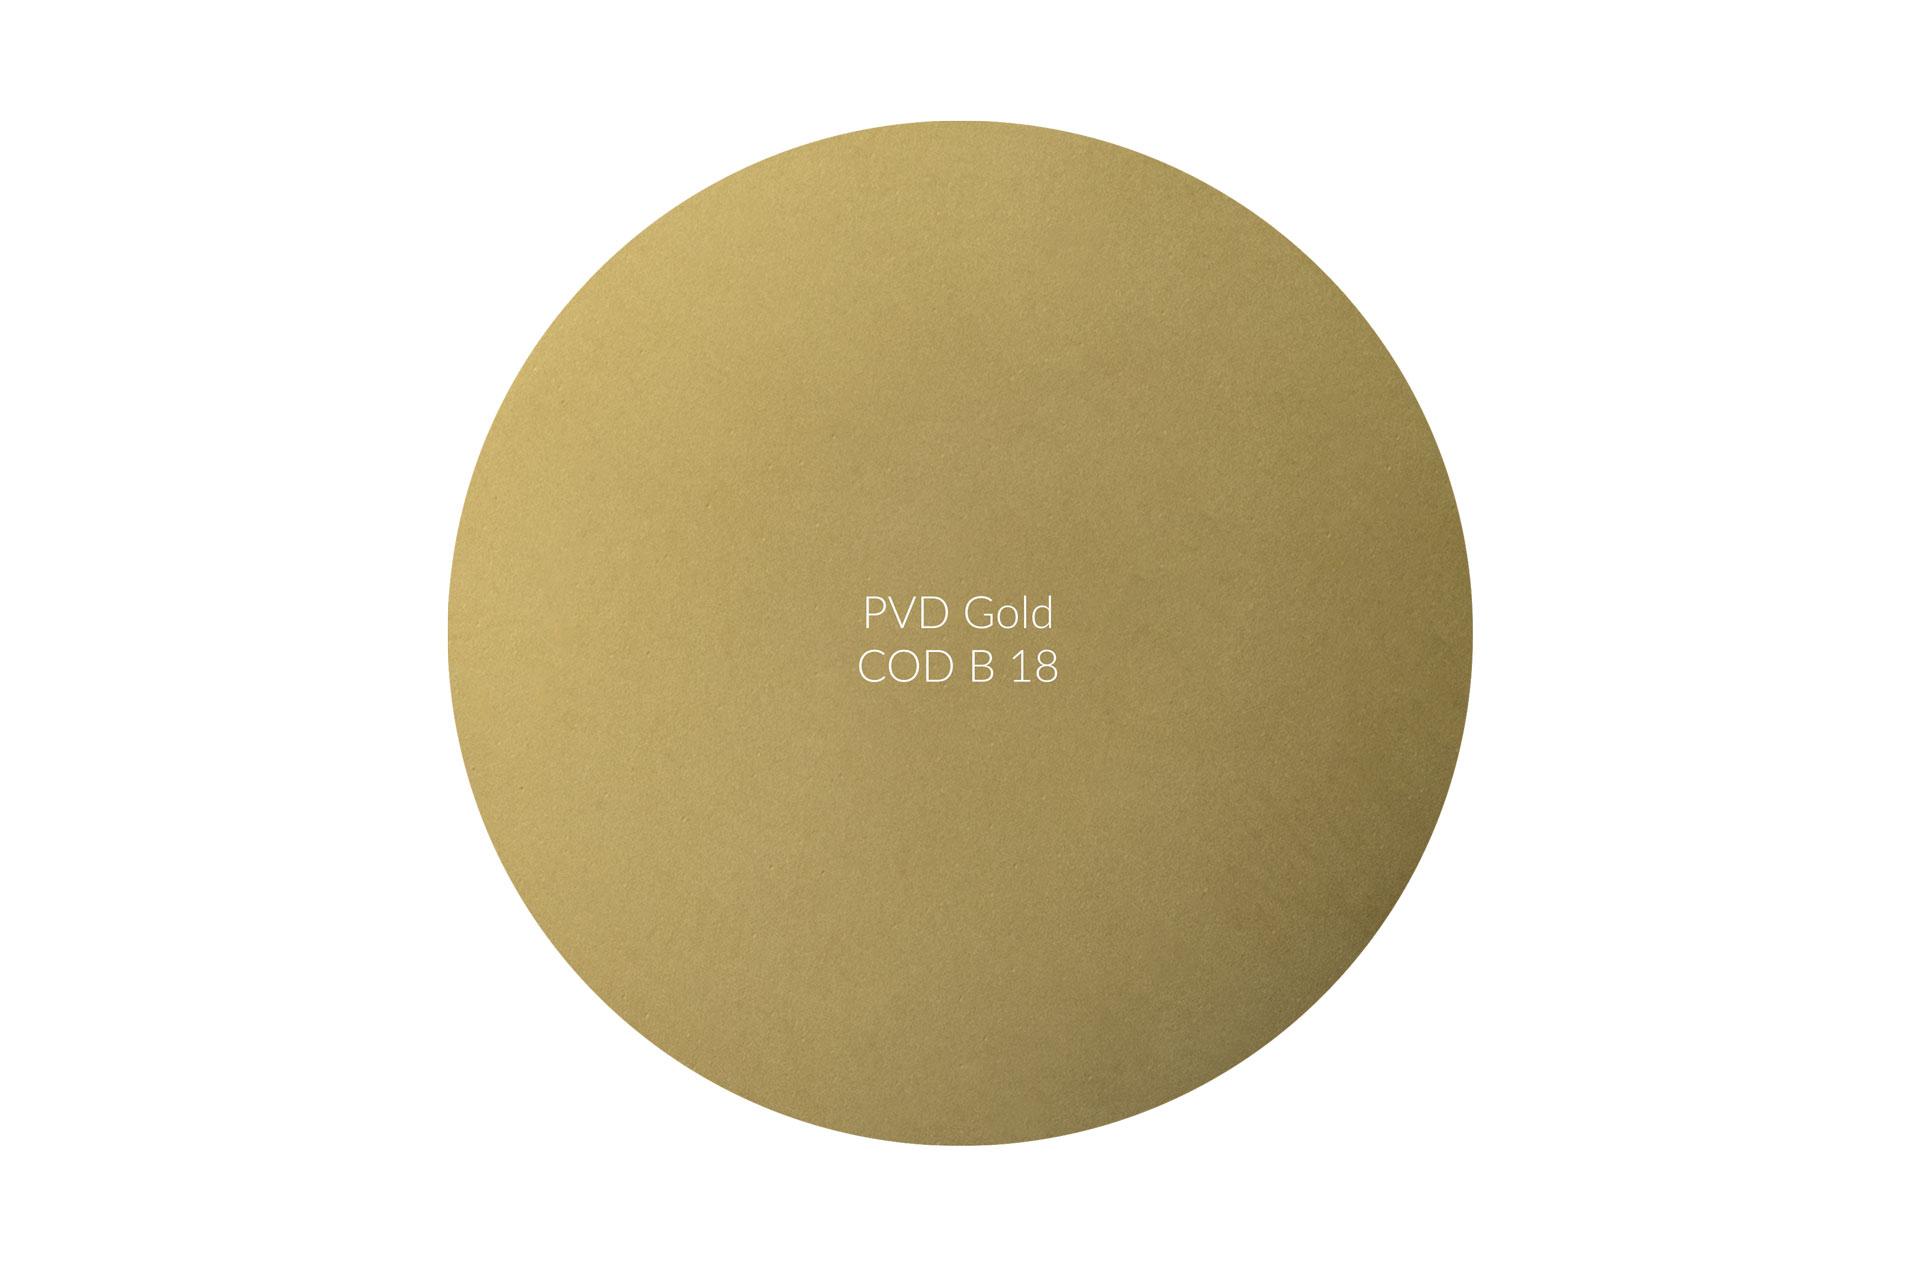 Dischetto PVD gold cod B 18 opaco